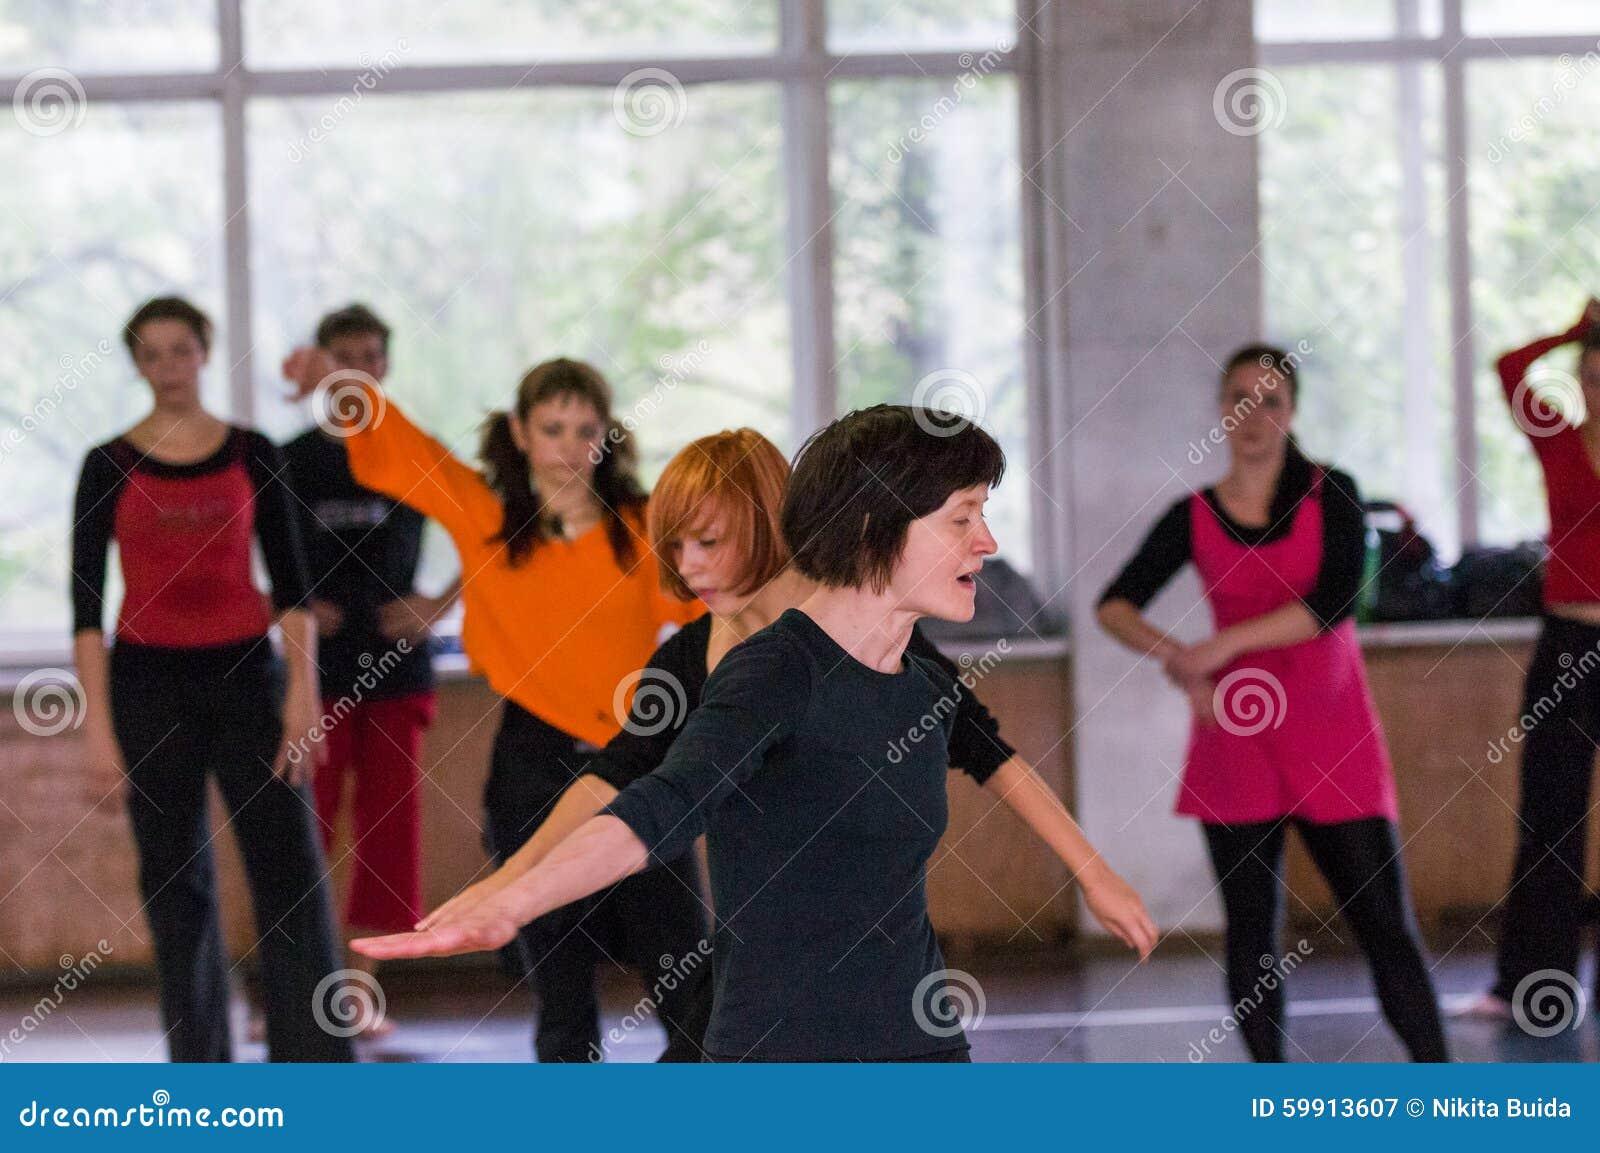 Dance school in Moscow 38